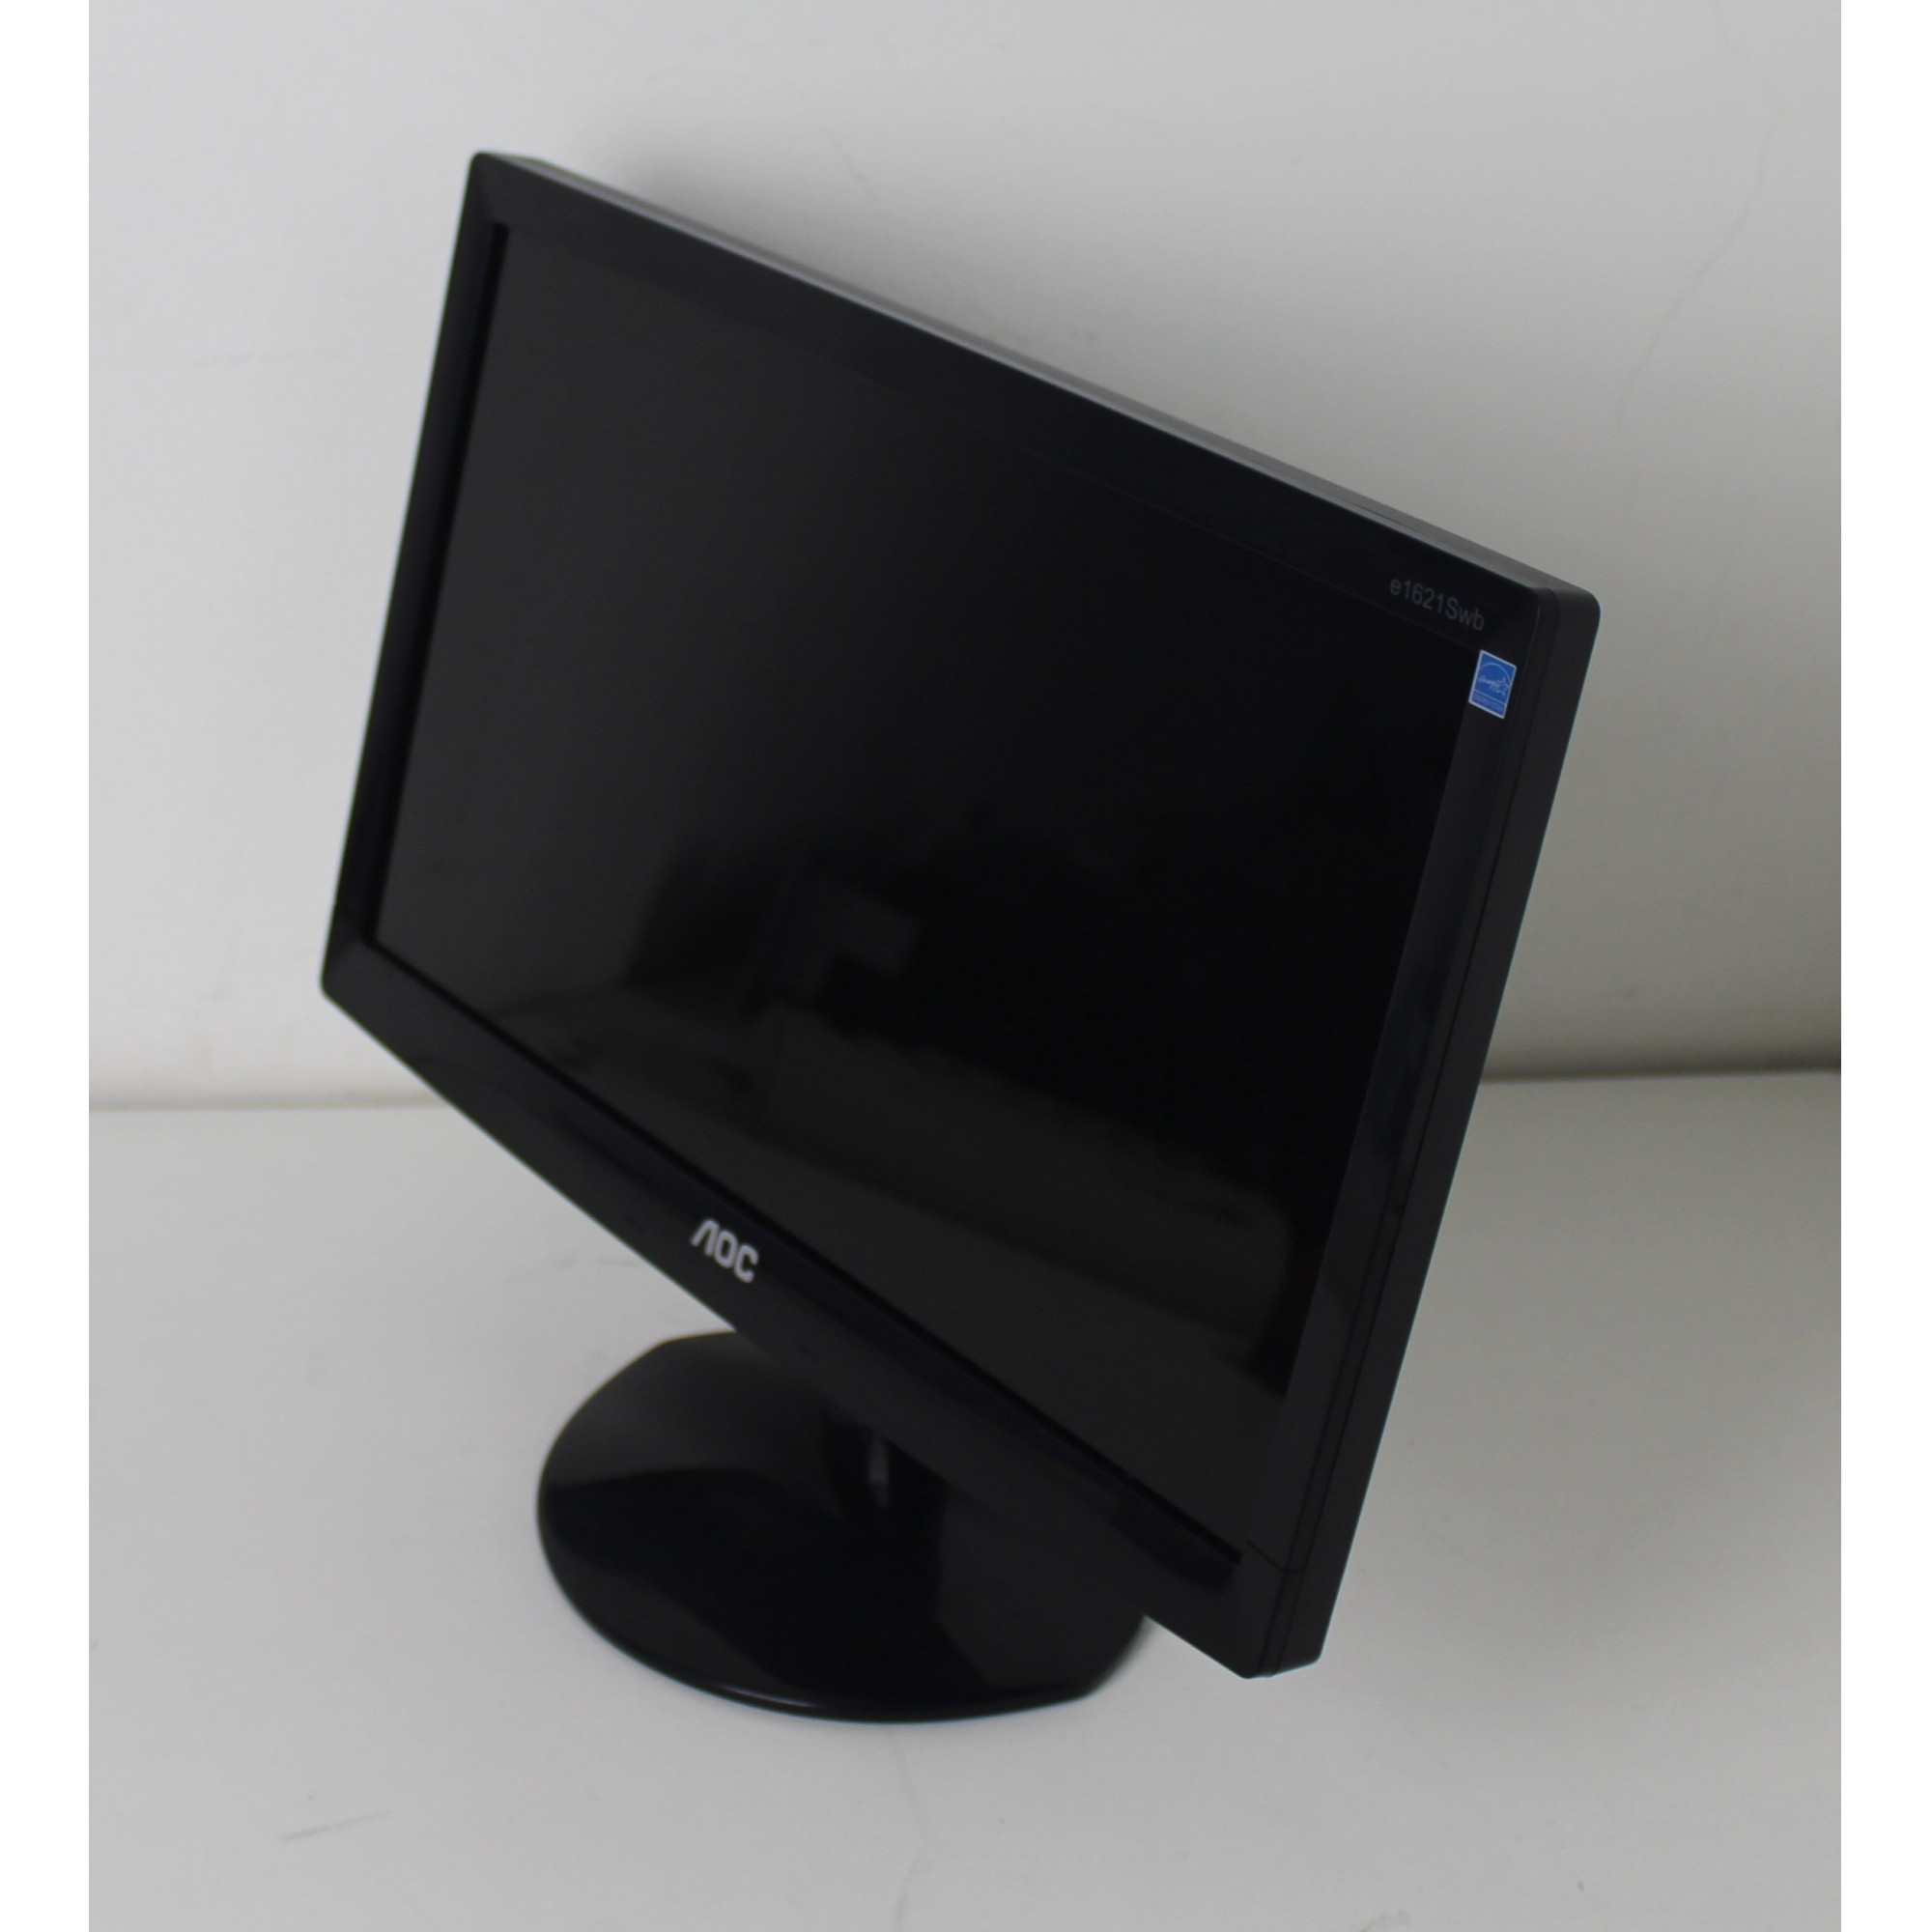 Monitor AOC E1621Swb 15.6 Polegadas - LED